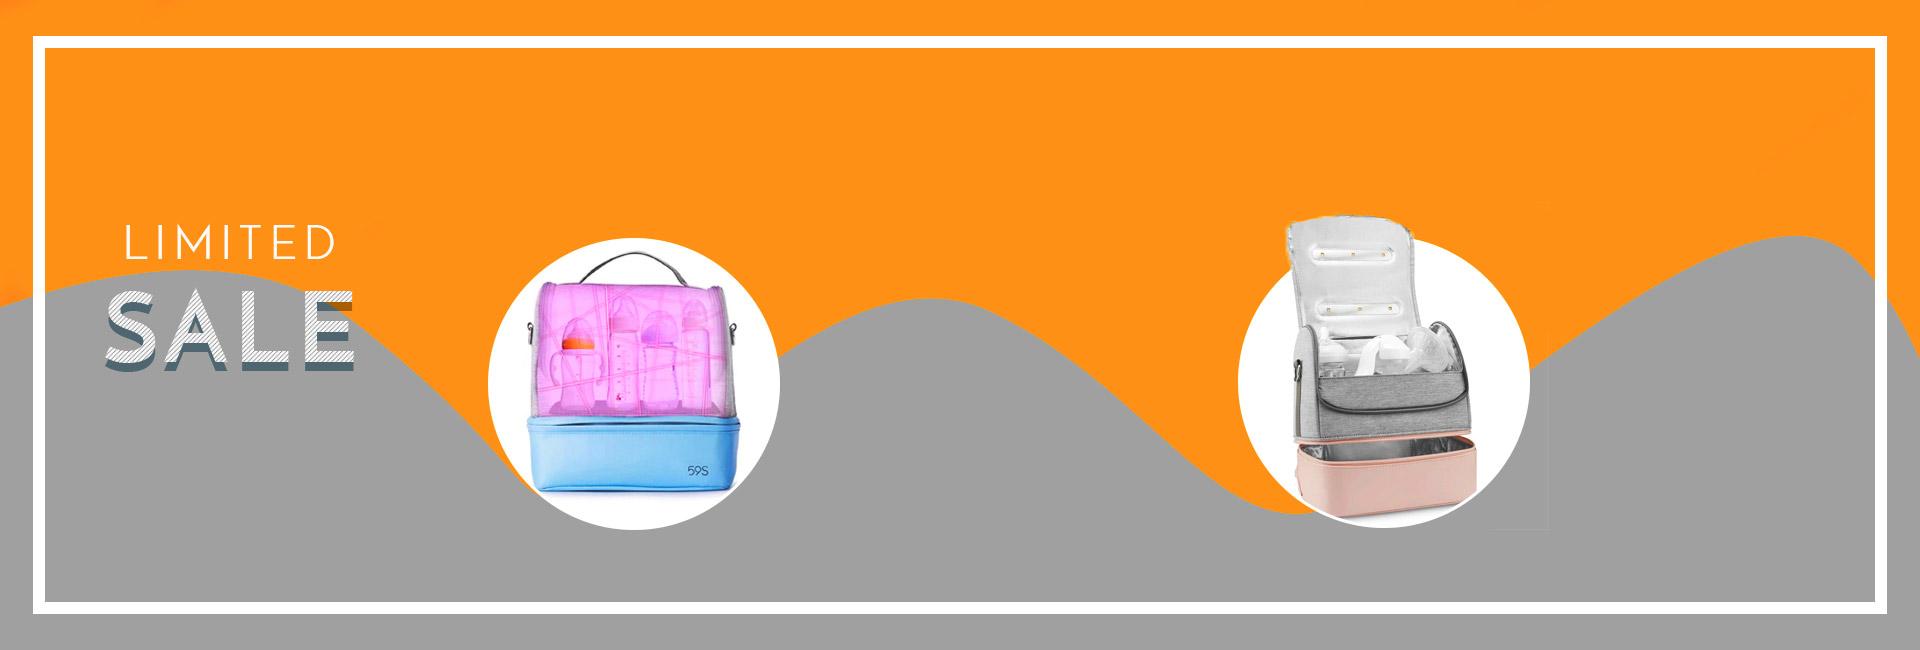 59s Sanitation Bag sale